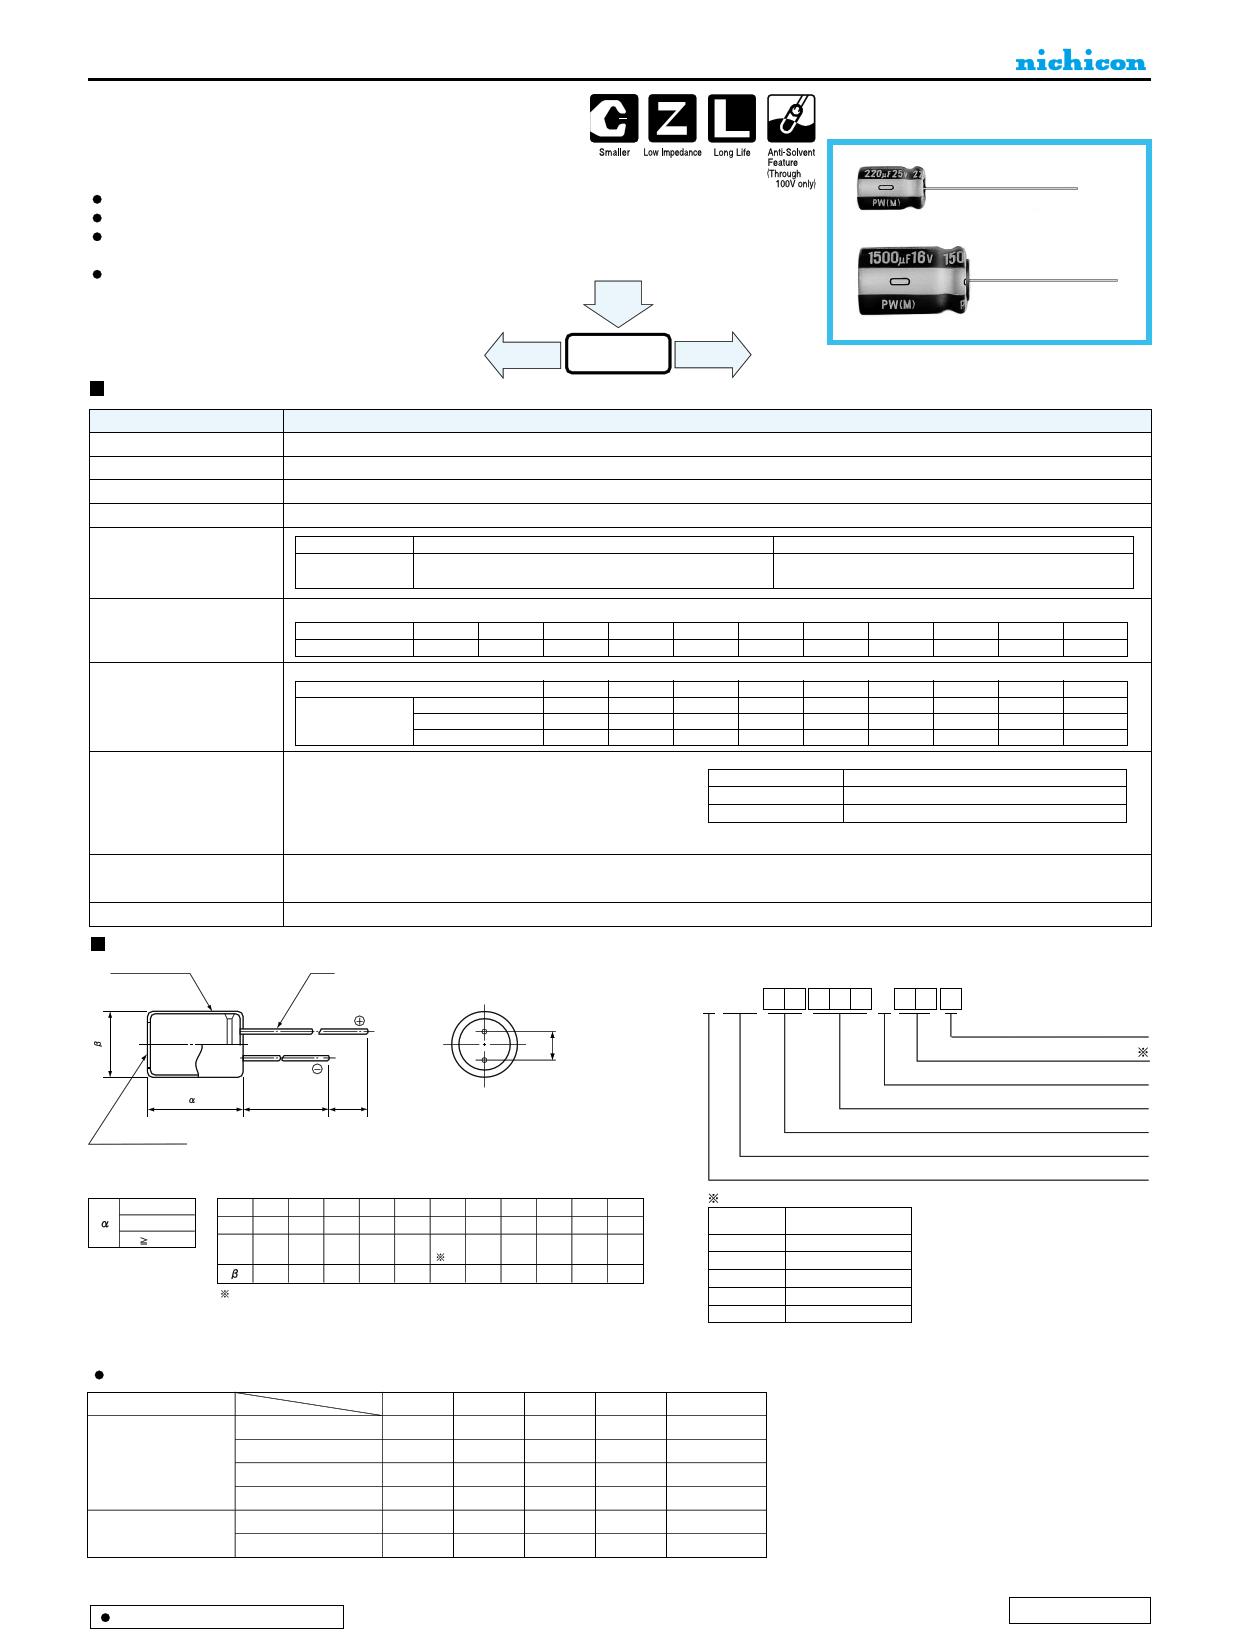 UPW1J331MHD 데이터시트 및 UPW1J331MHD PDF